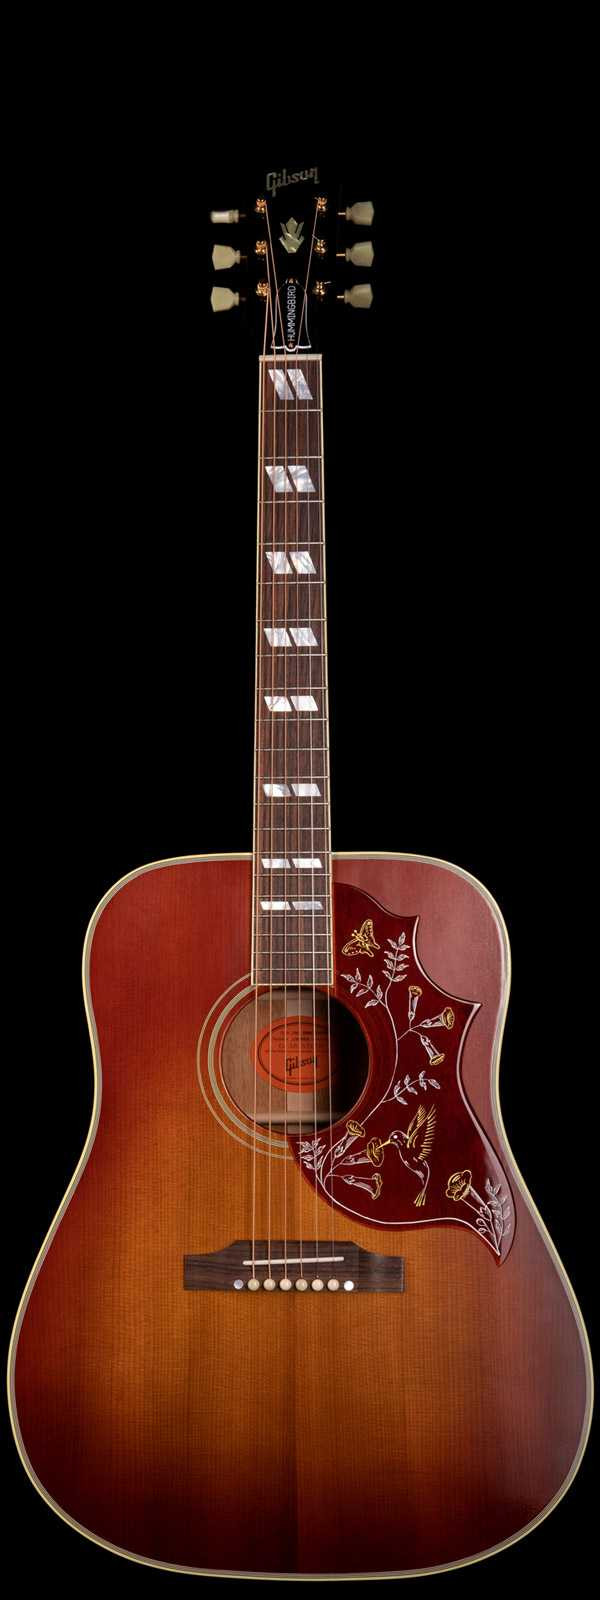 Gibson Custom Shop 1960 Hummingbird Fixed Bridge Heritage Cherry Sunburst VOS